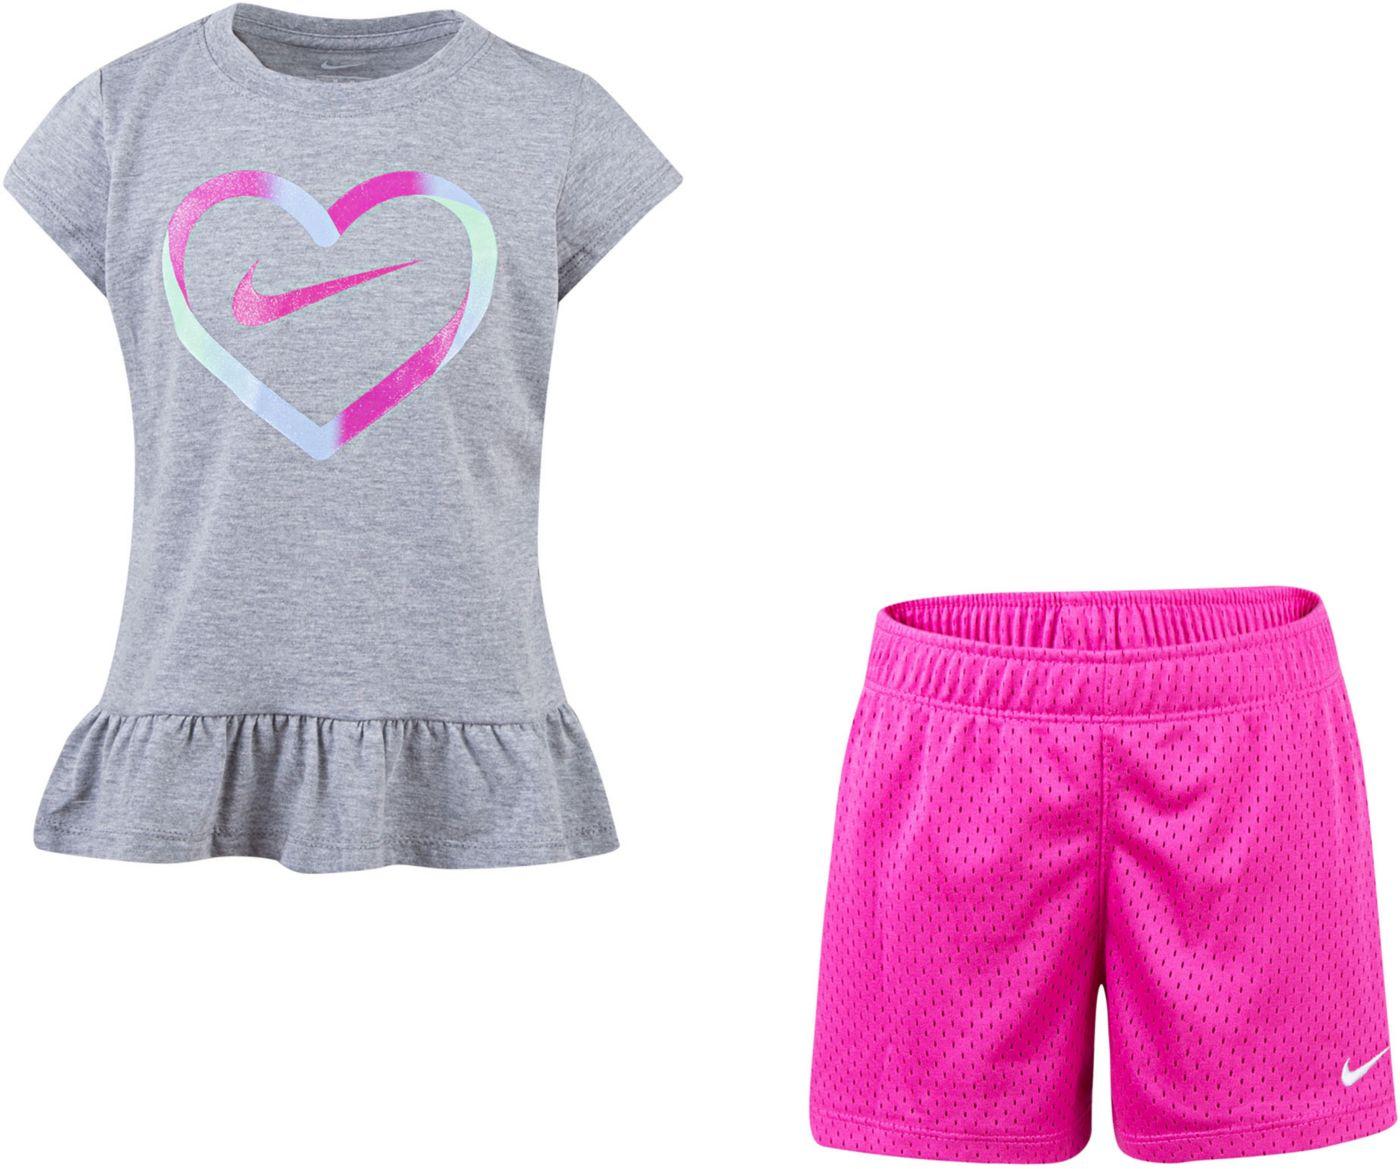 Nike Little Girls' Ruffle Top and Shorts Set